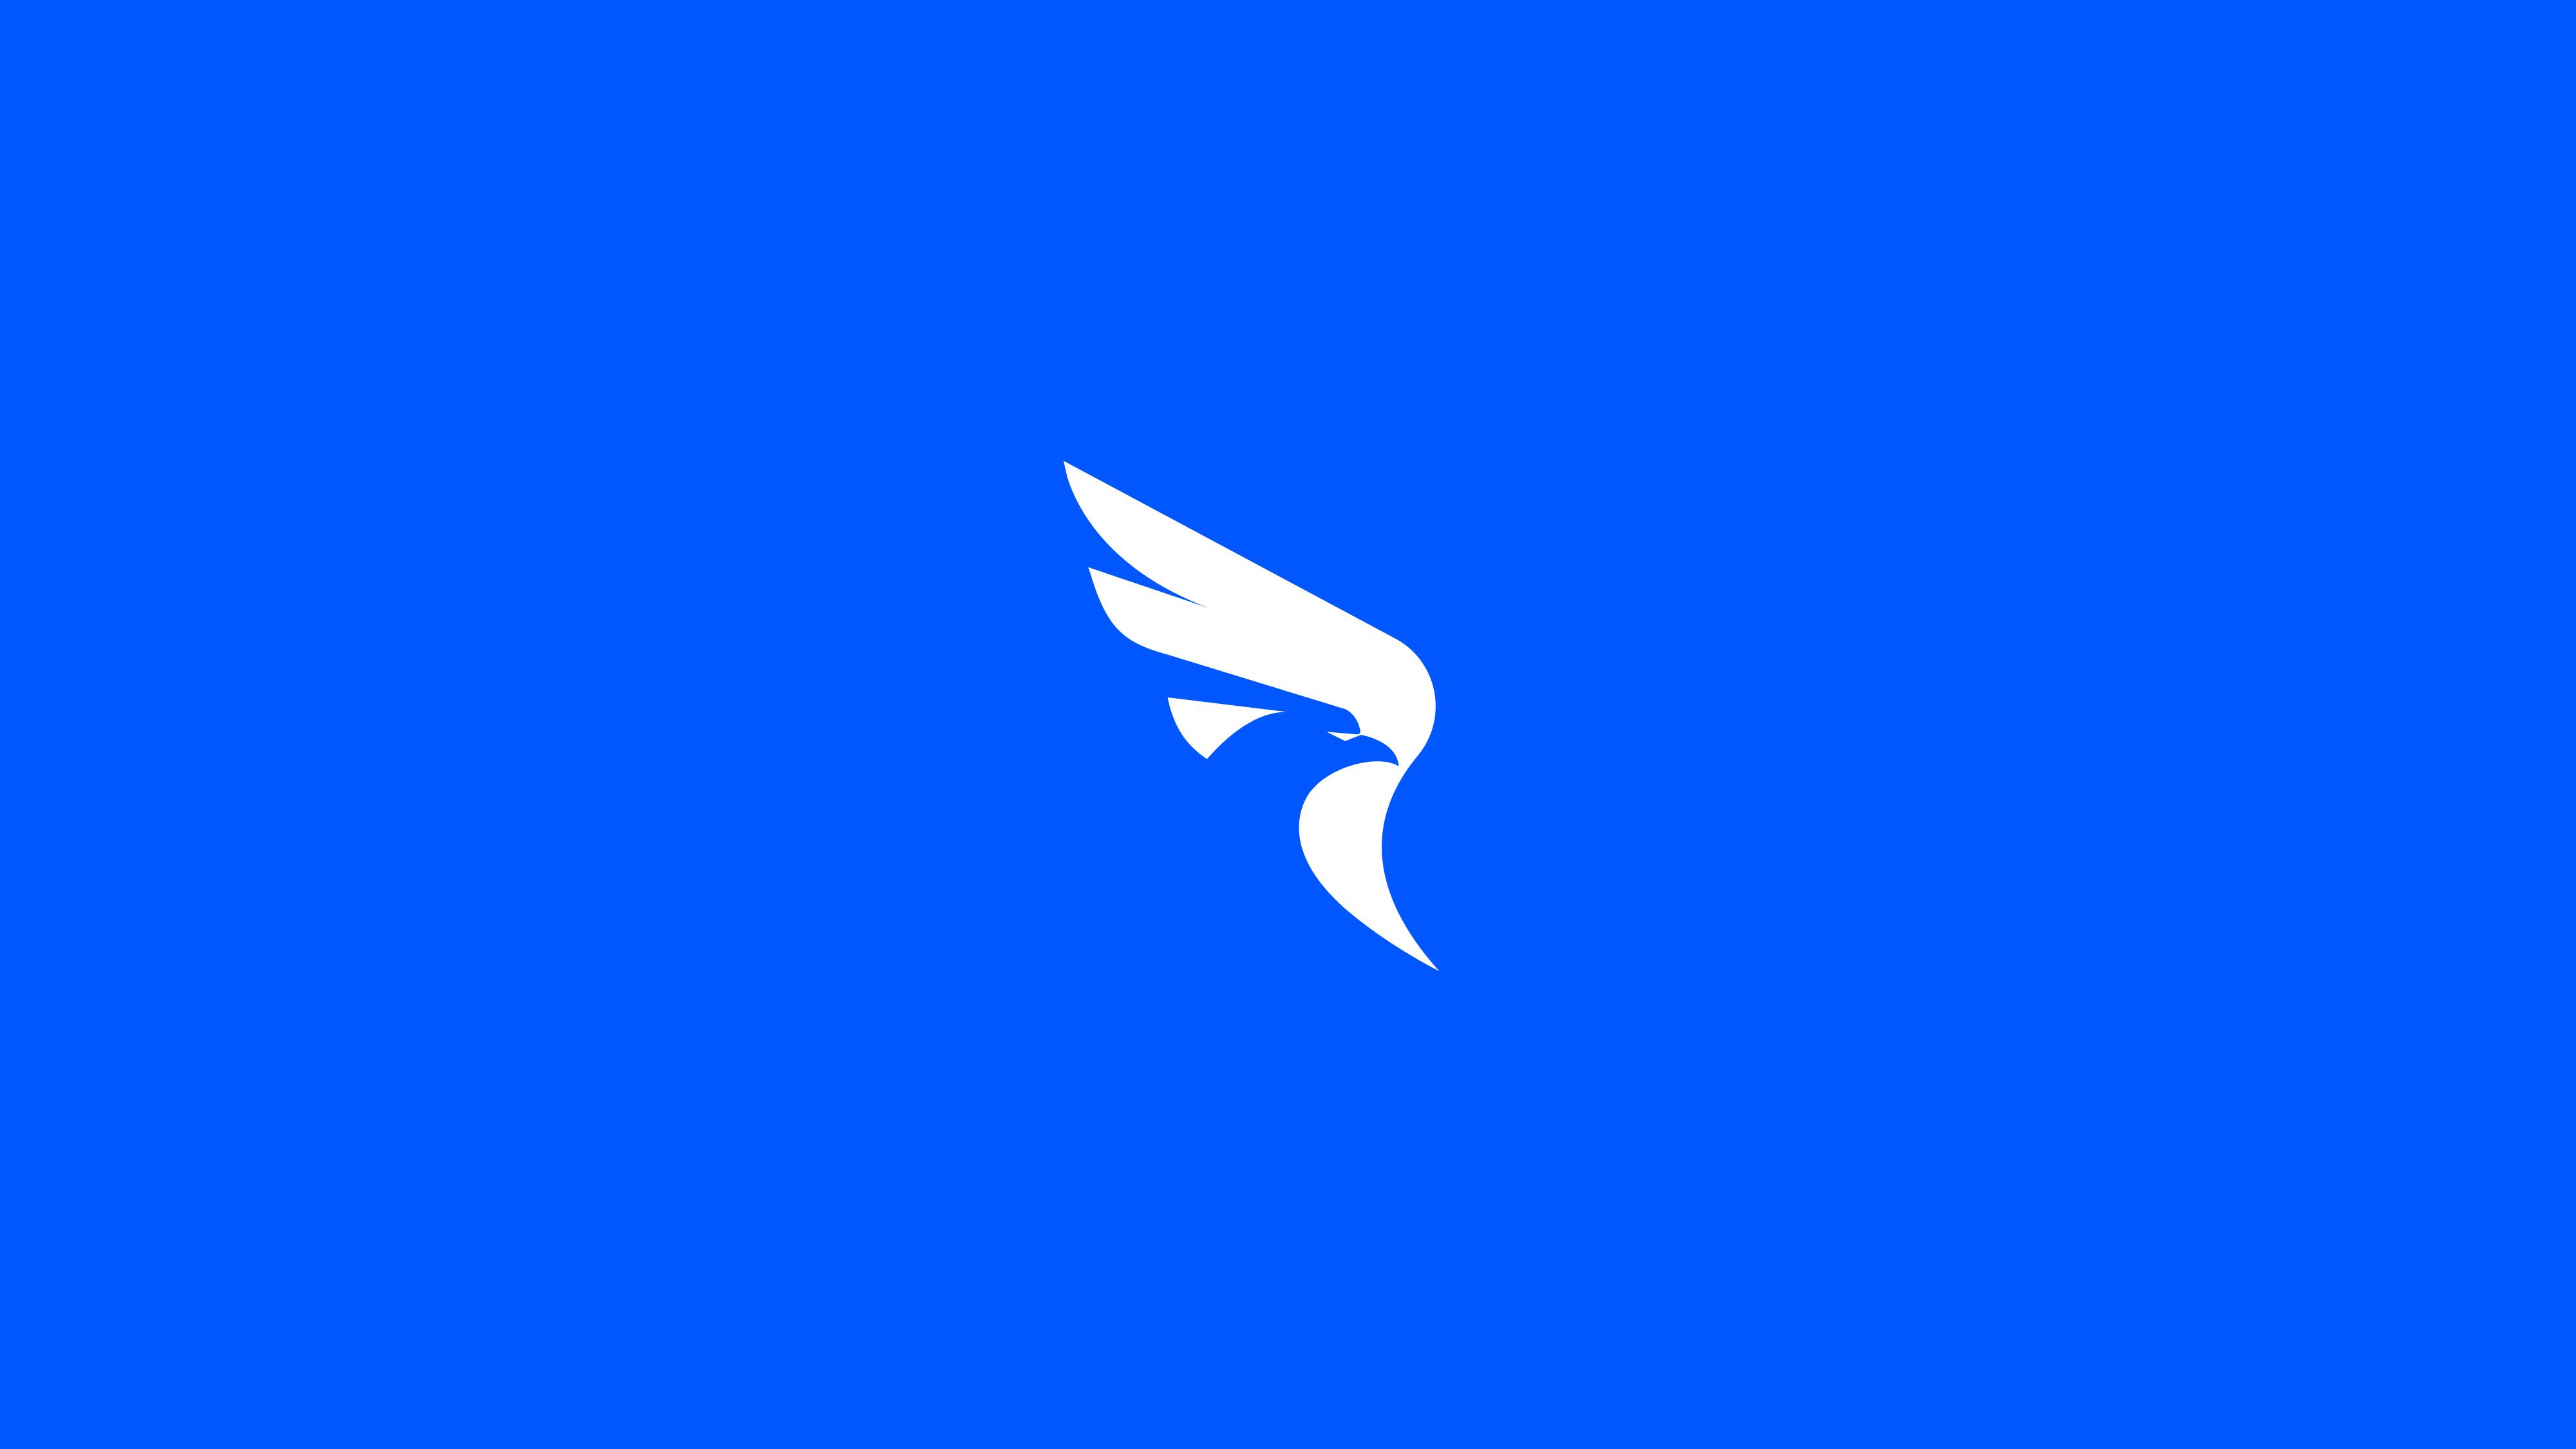 Eagle-Bird-logo-portfolio-vol-1-by-DAINOGO